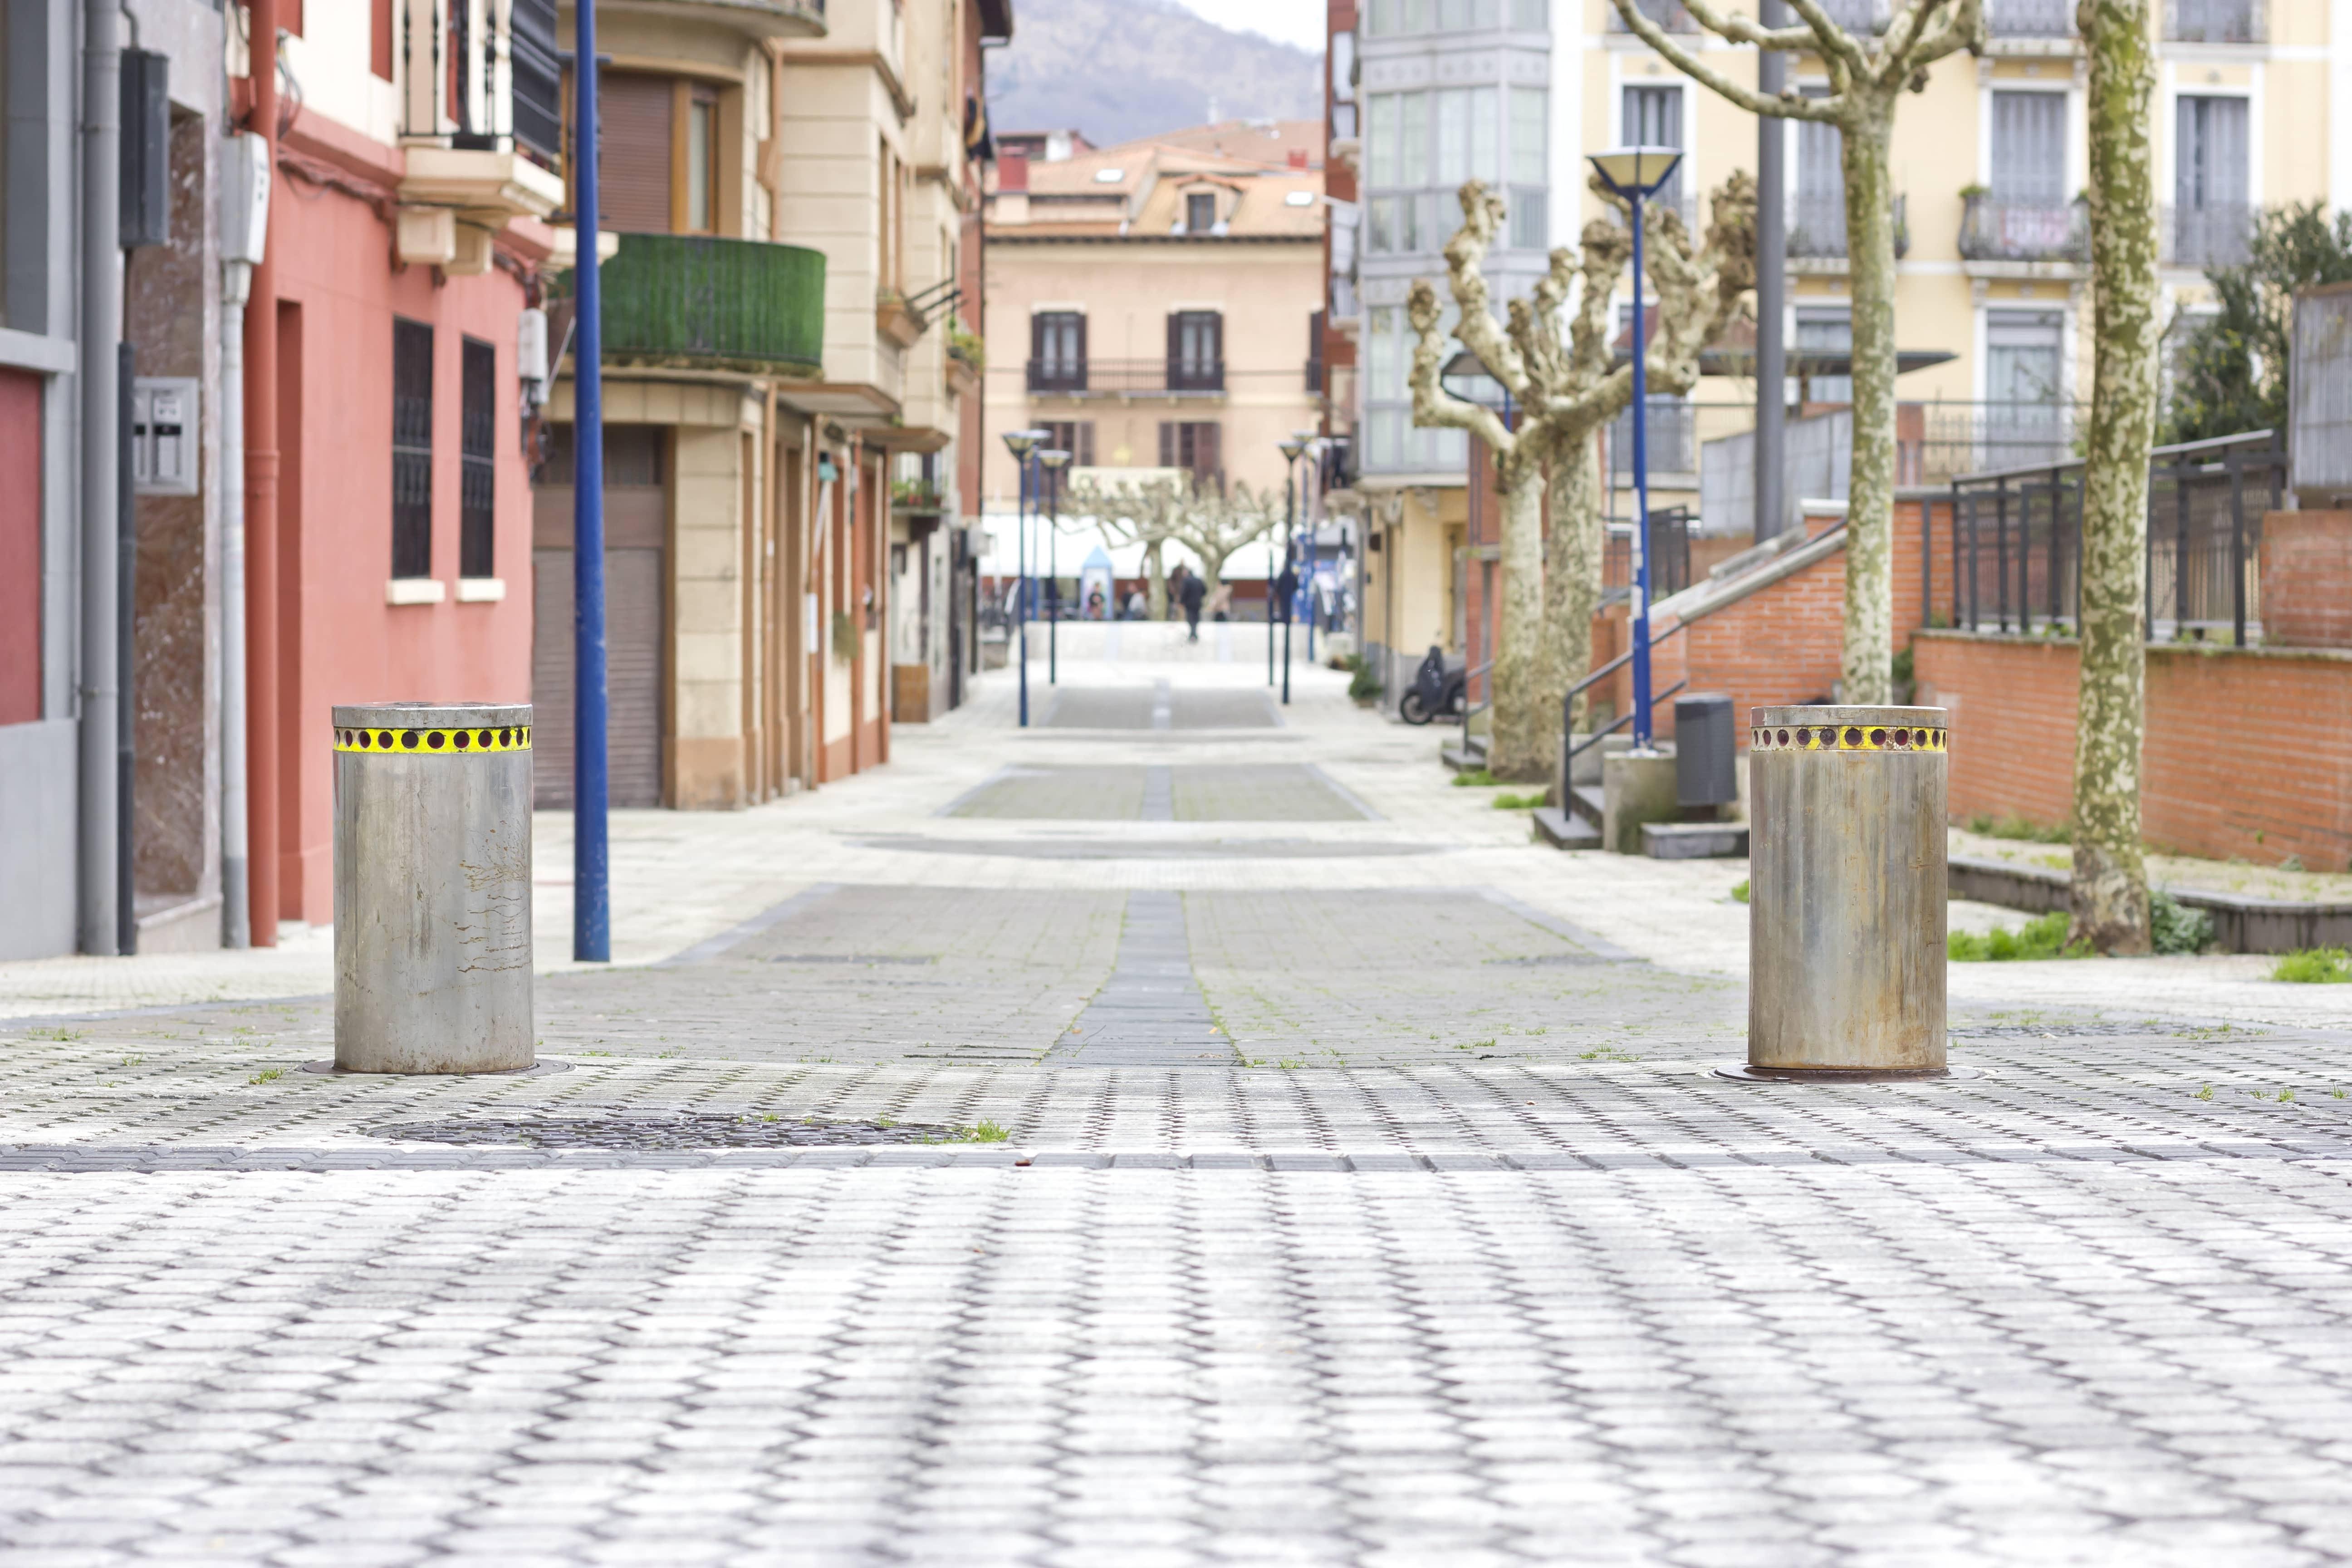 Street bollards